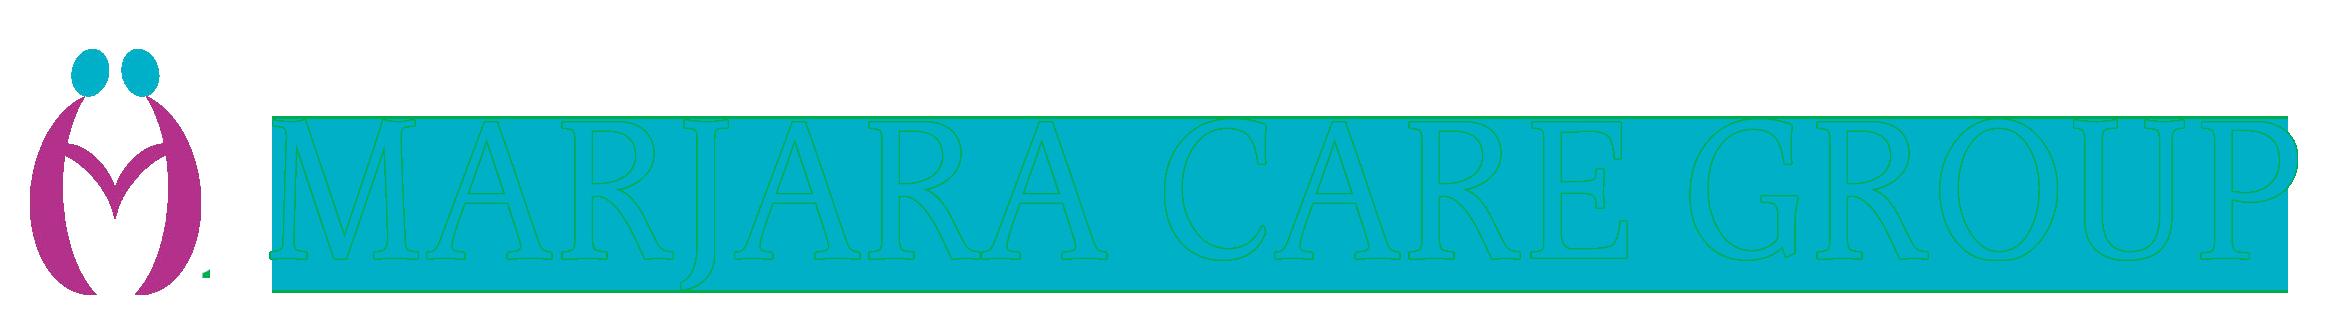 Marjara Care Group